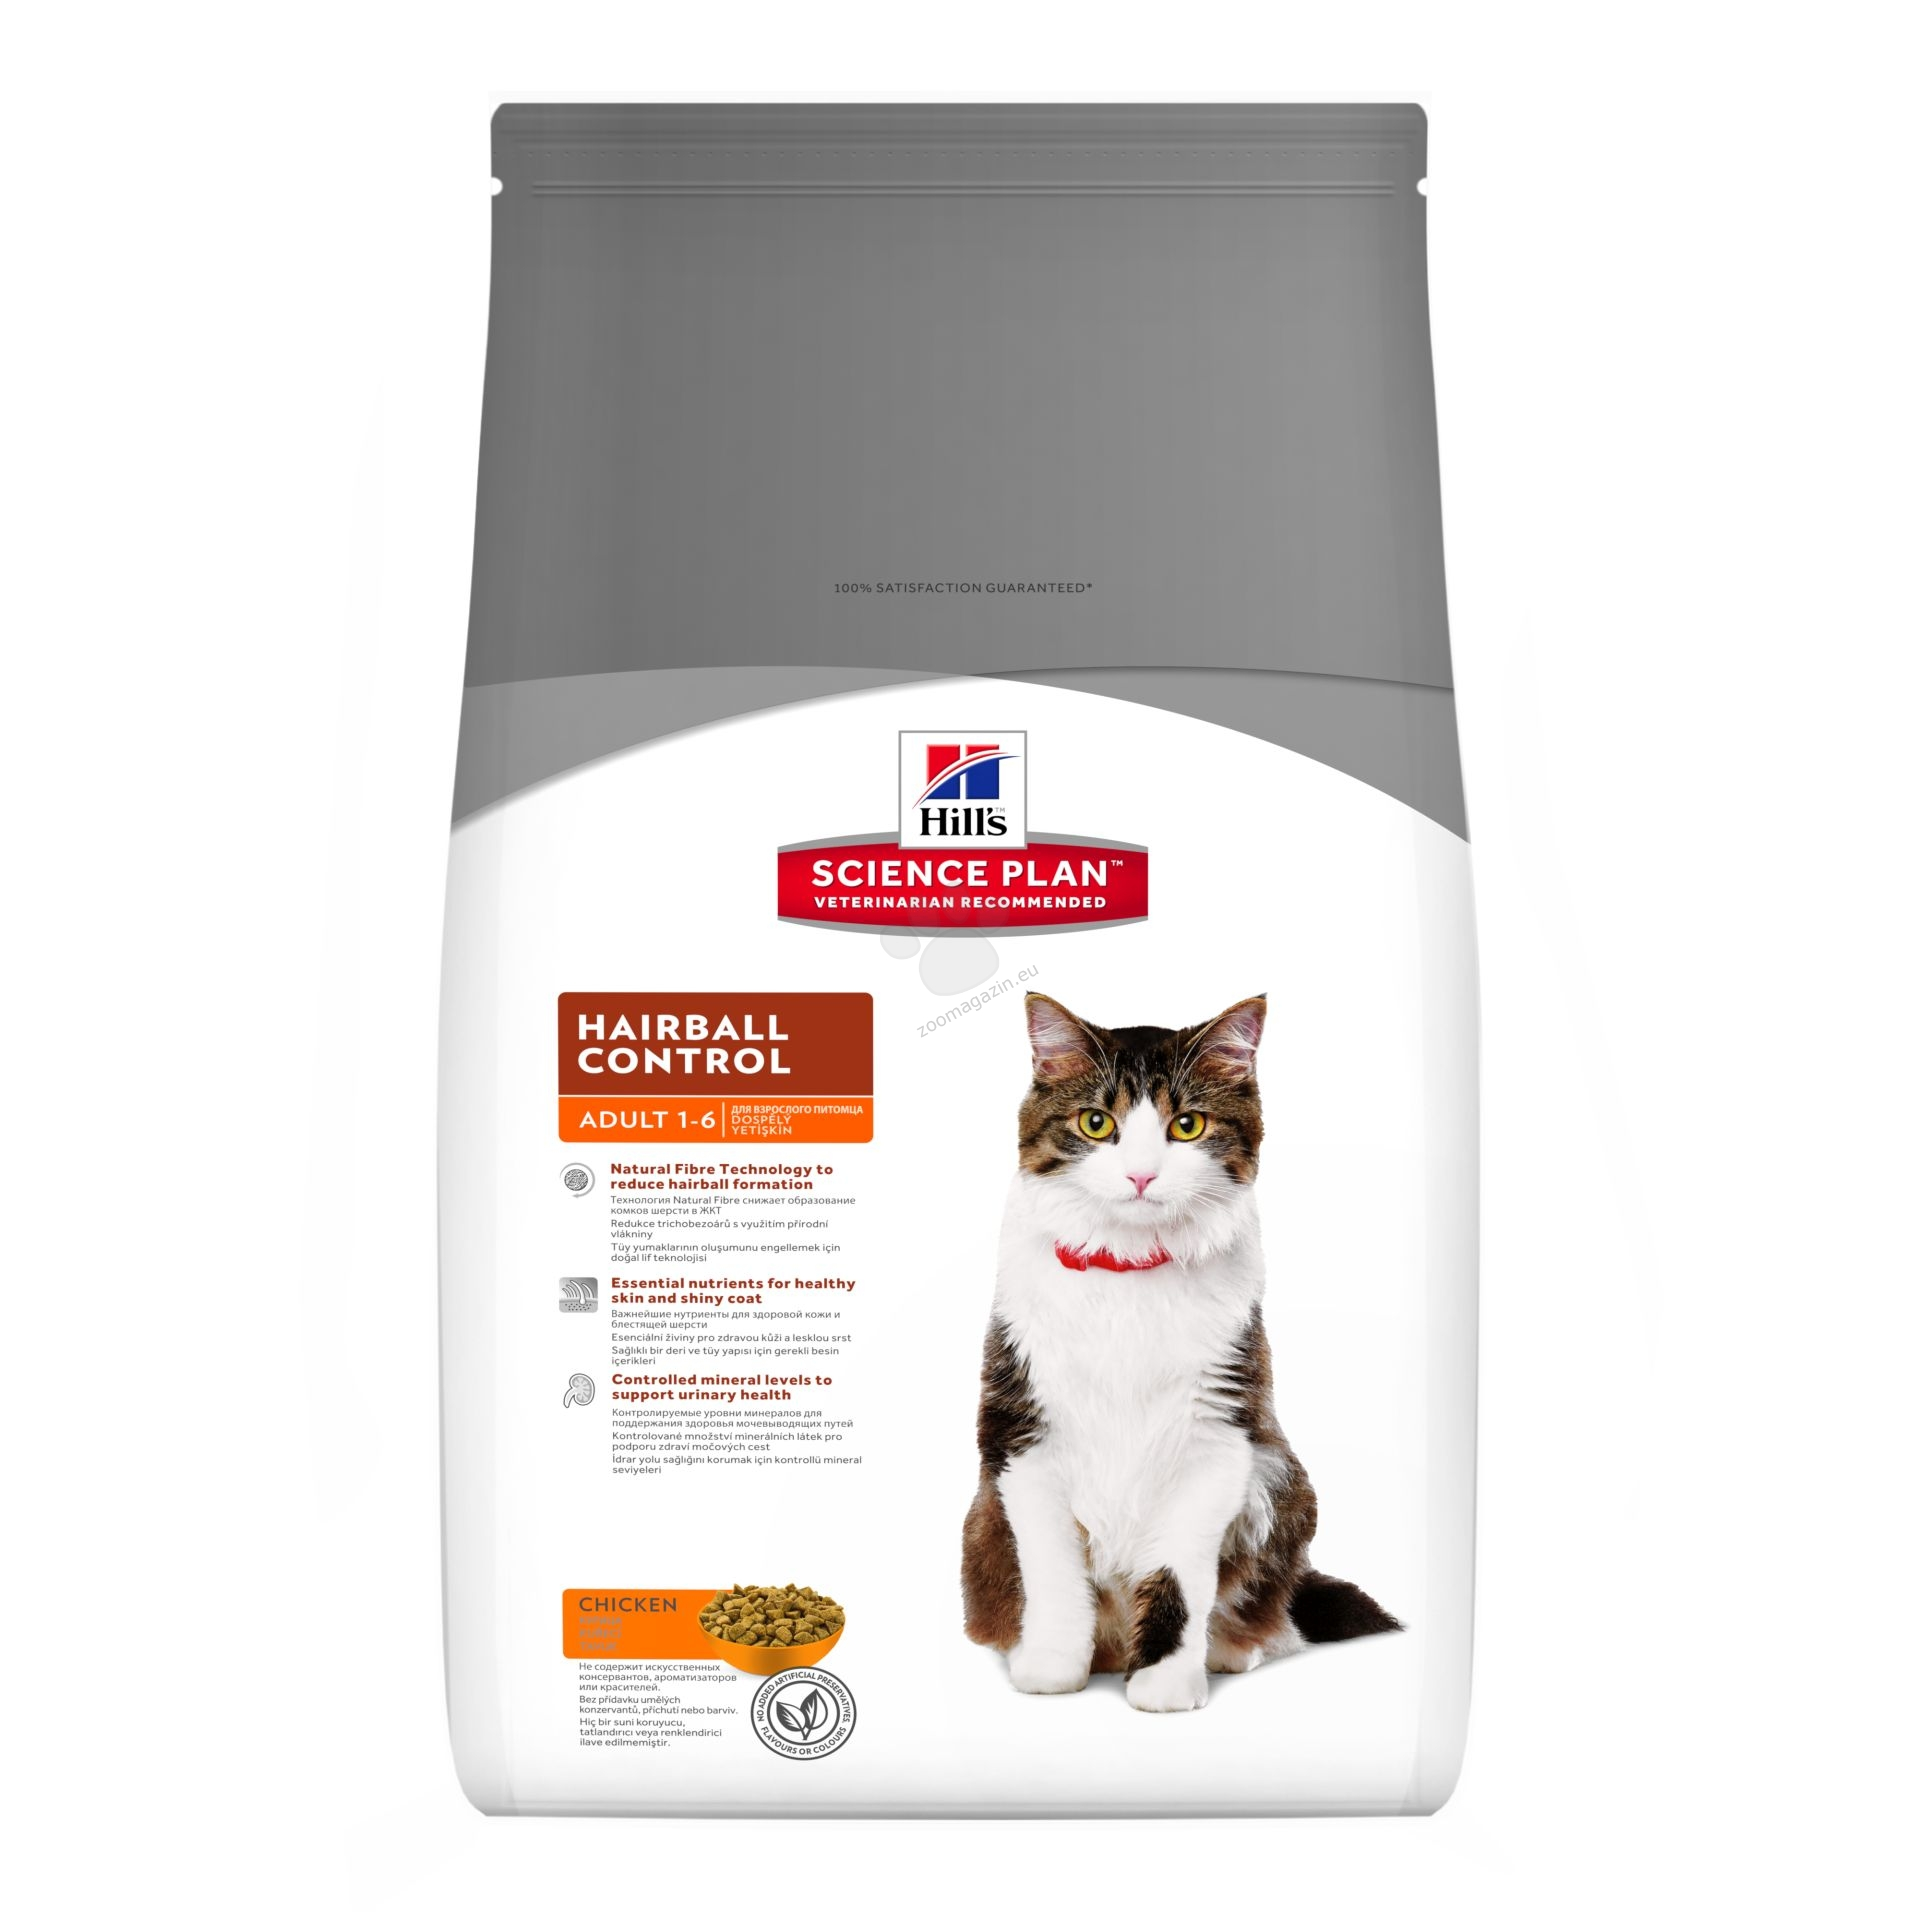 Science Plan Feline Adult Hairball Control Chicken - Пълноценна храна за намаляване на космените топки 5 кг. + ПОДАРЪК: 1 кутия x 12 пауча Adult FAVOURITE SELECTION